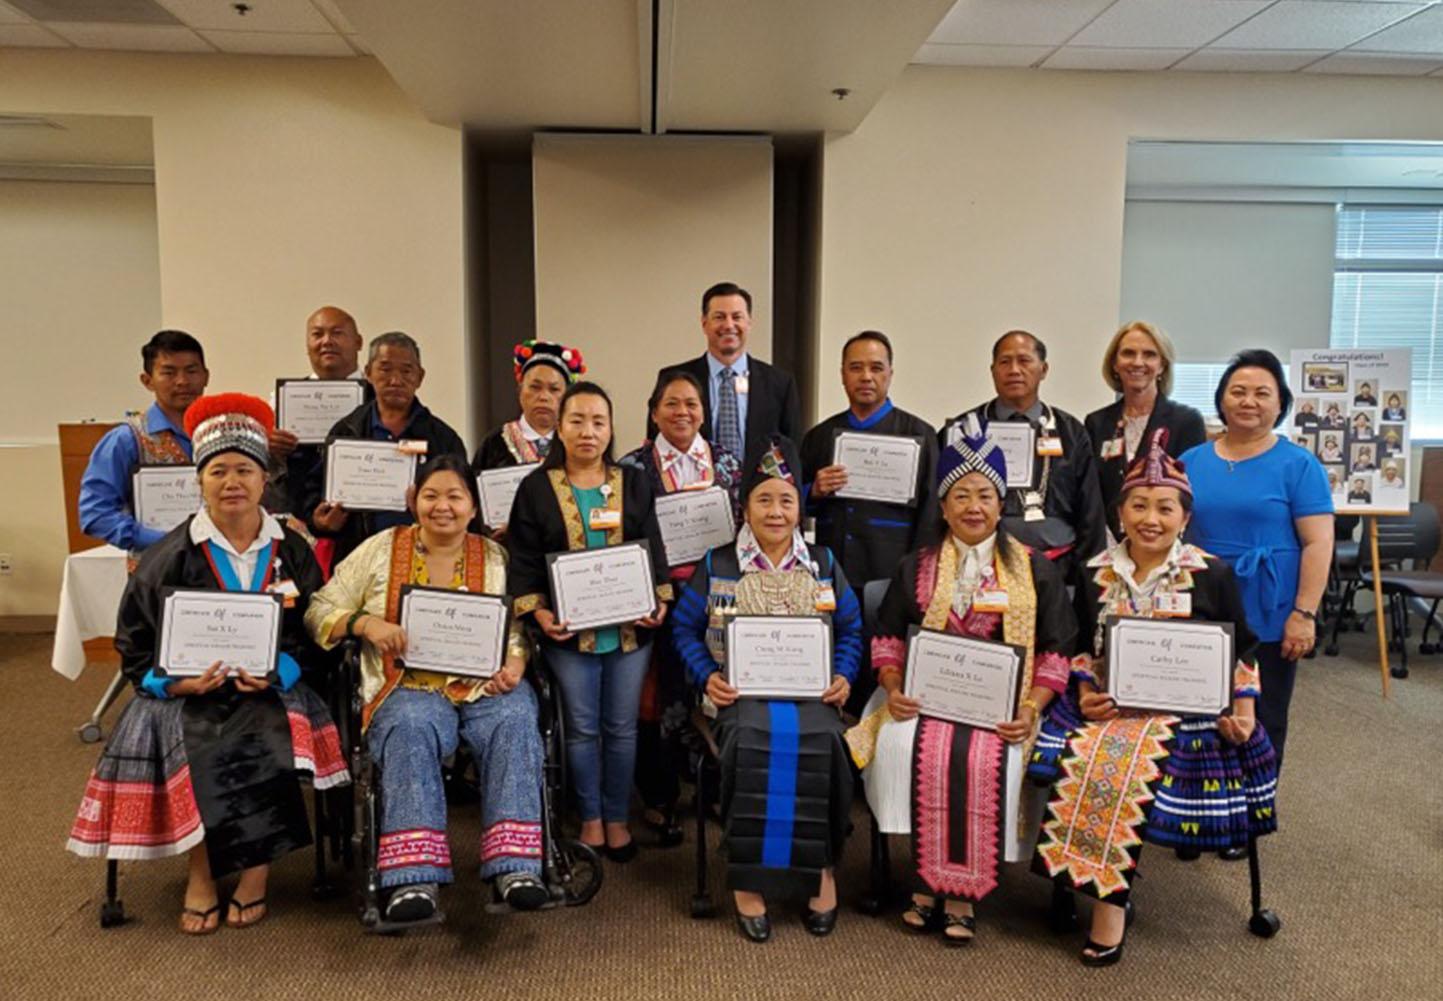 Hmong shaman graduation ceremony